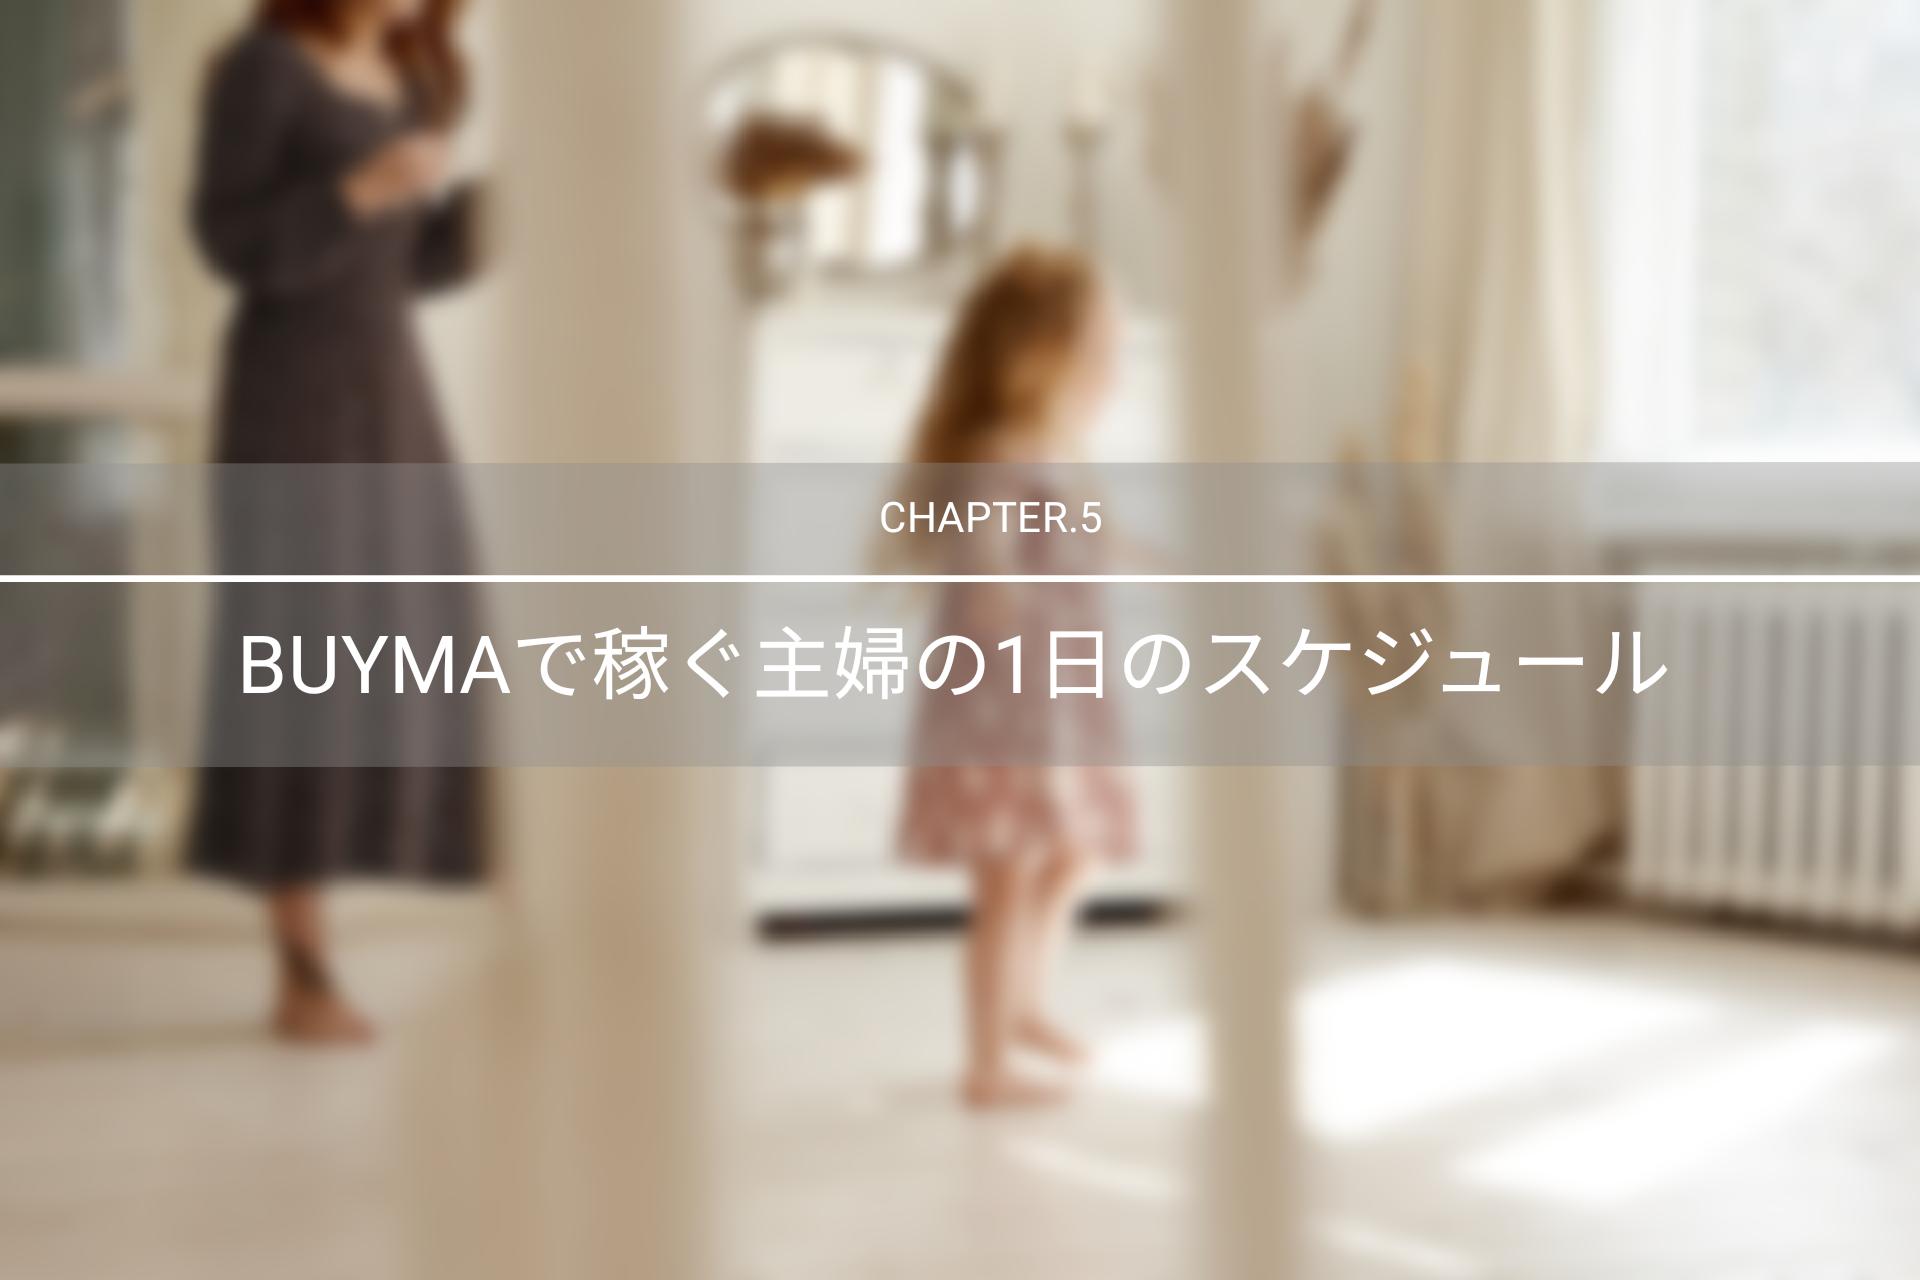 BUYMA(バイマ)主婦